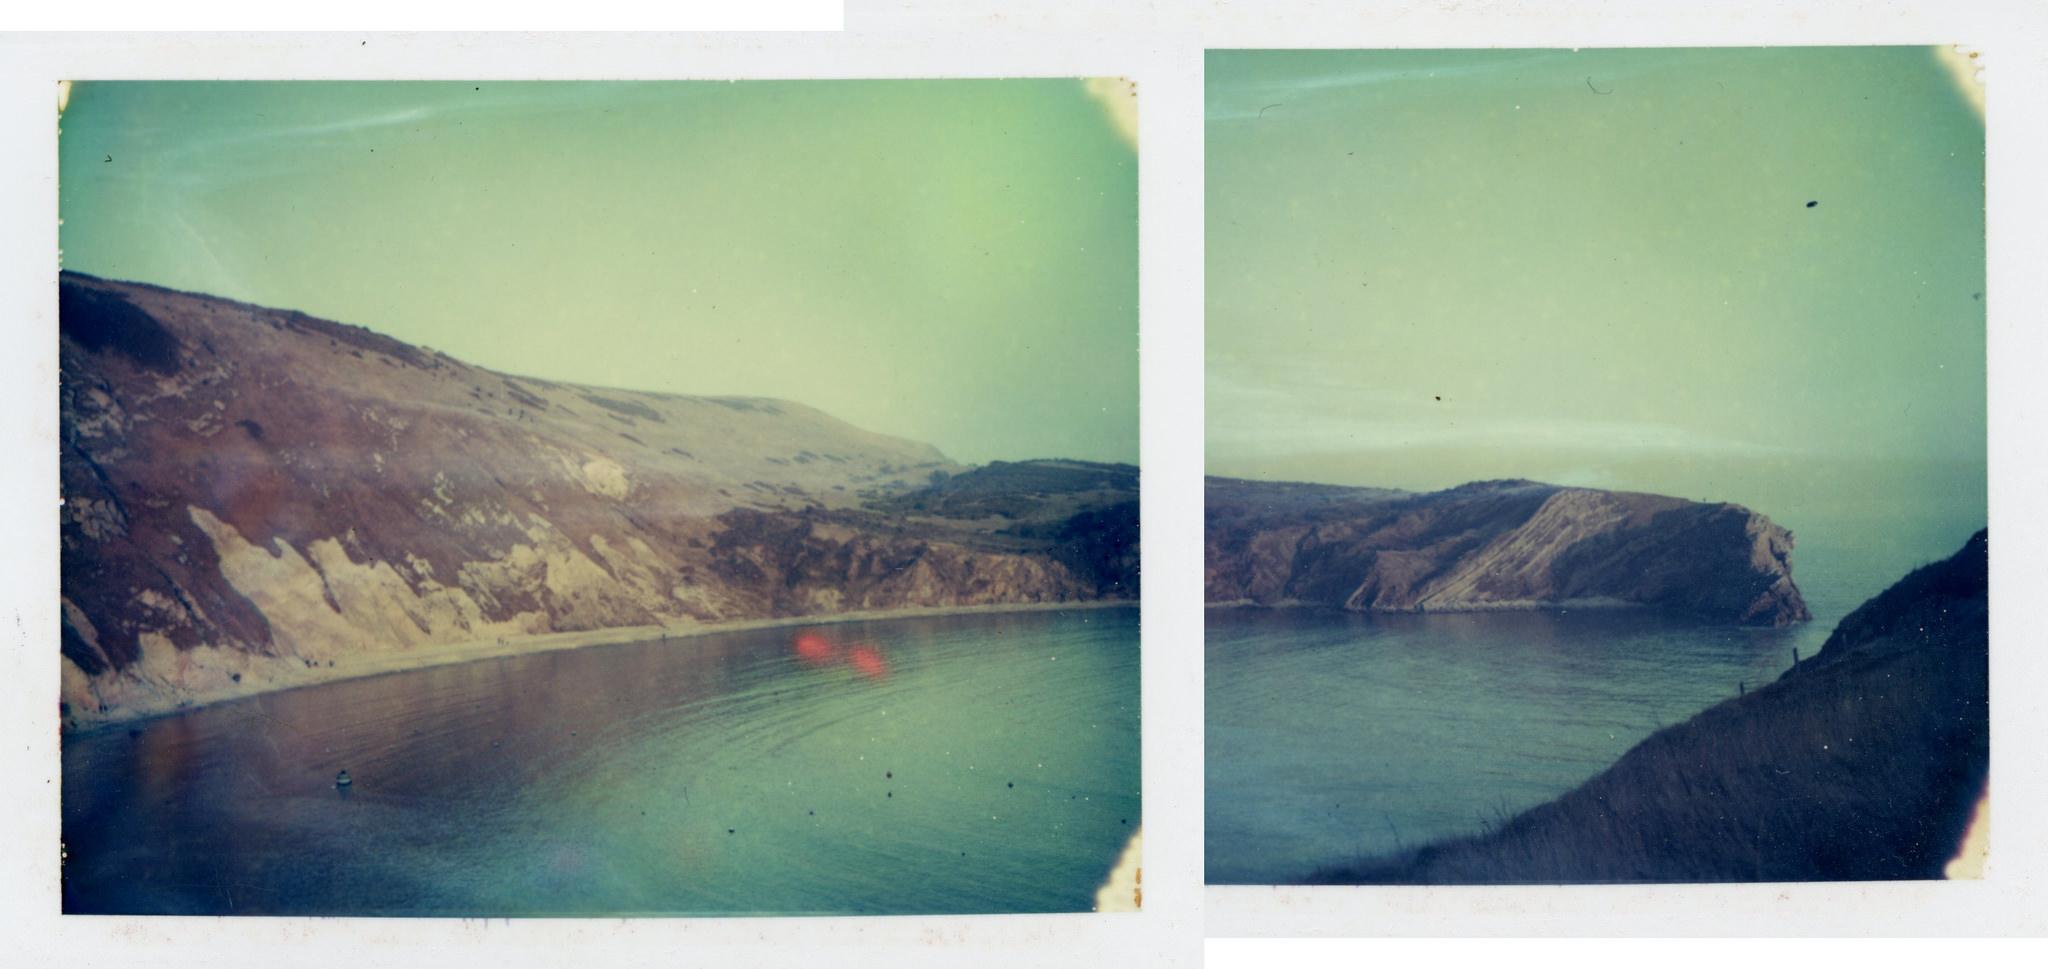 Lulworth Cove | Speed Graphic | Polaroid Type 108 FIlm | Matt Smith